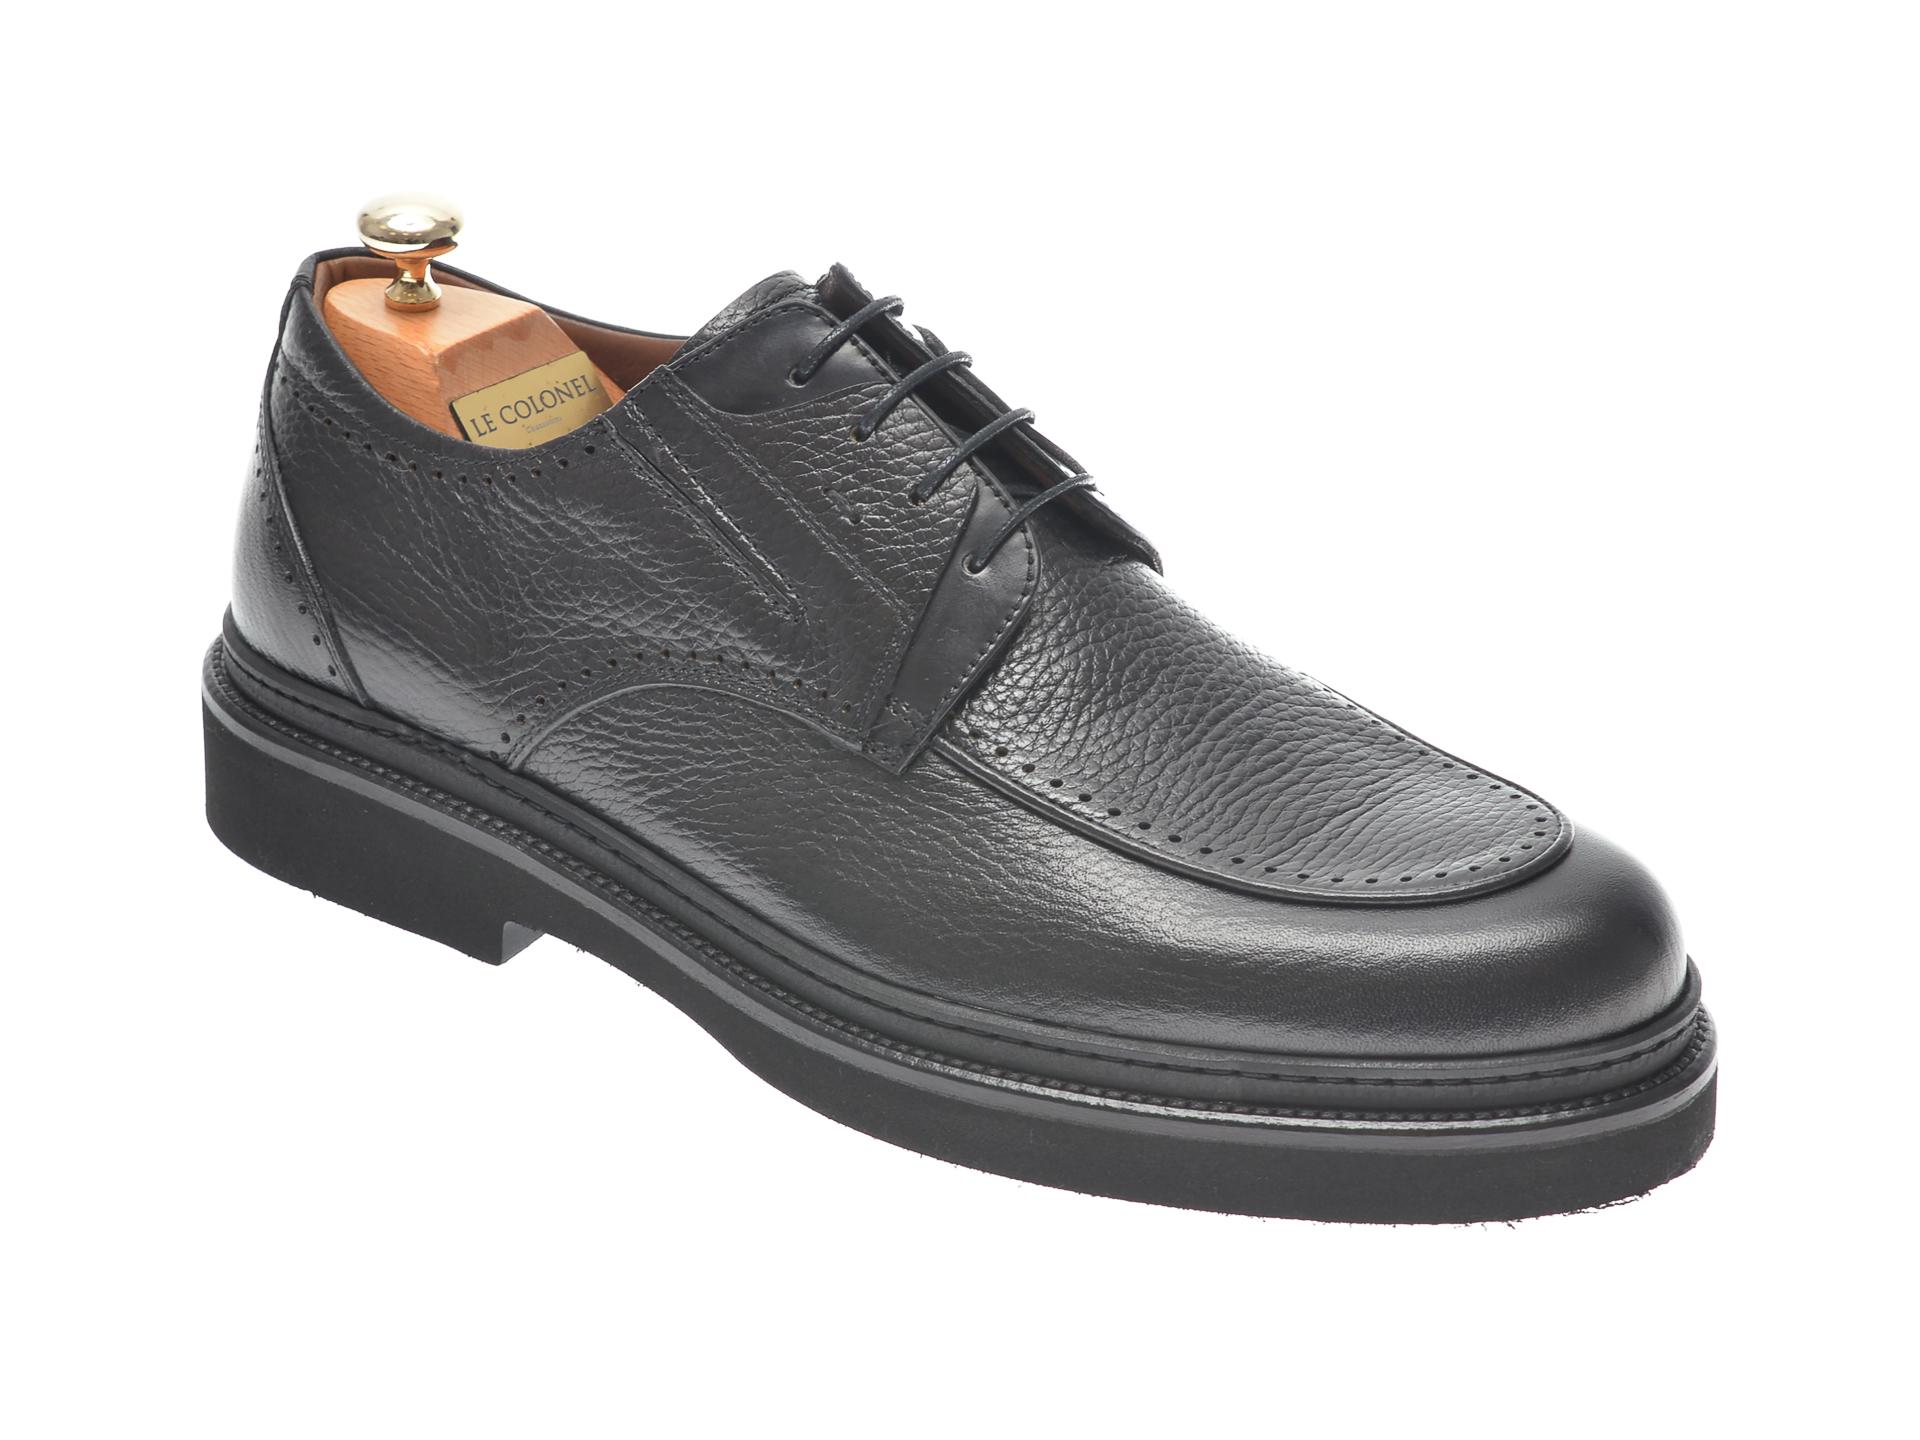 Pantofi LE COLONEL negri, 61603, din piele naturala imagine